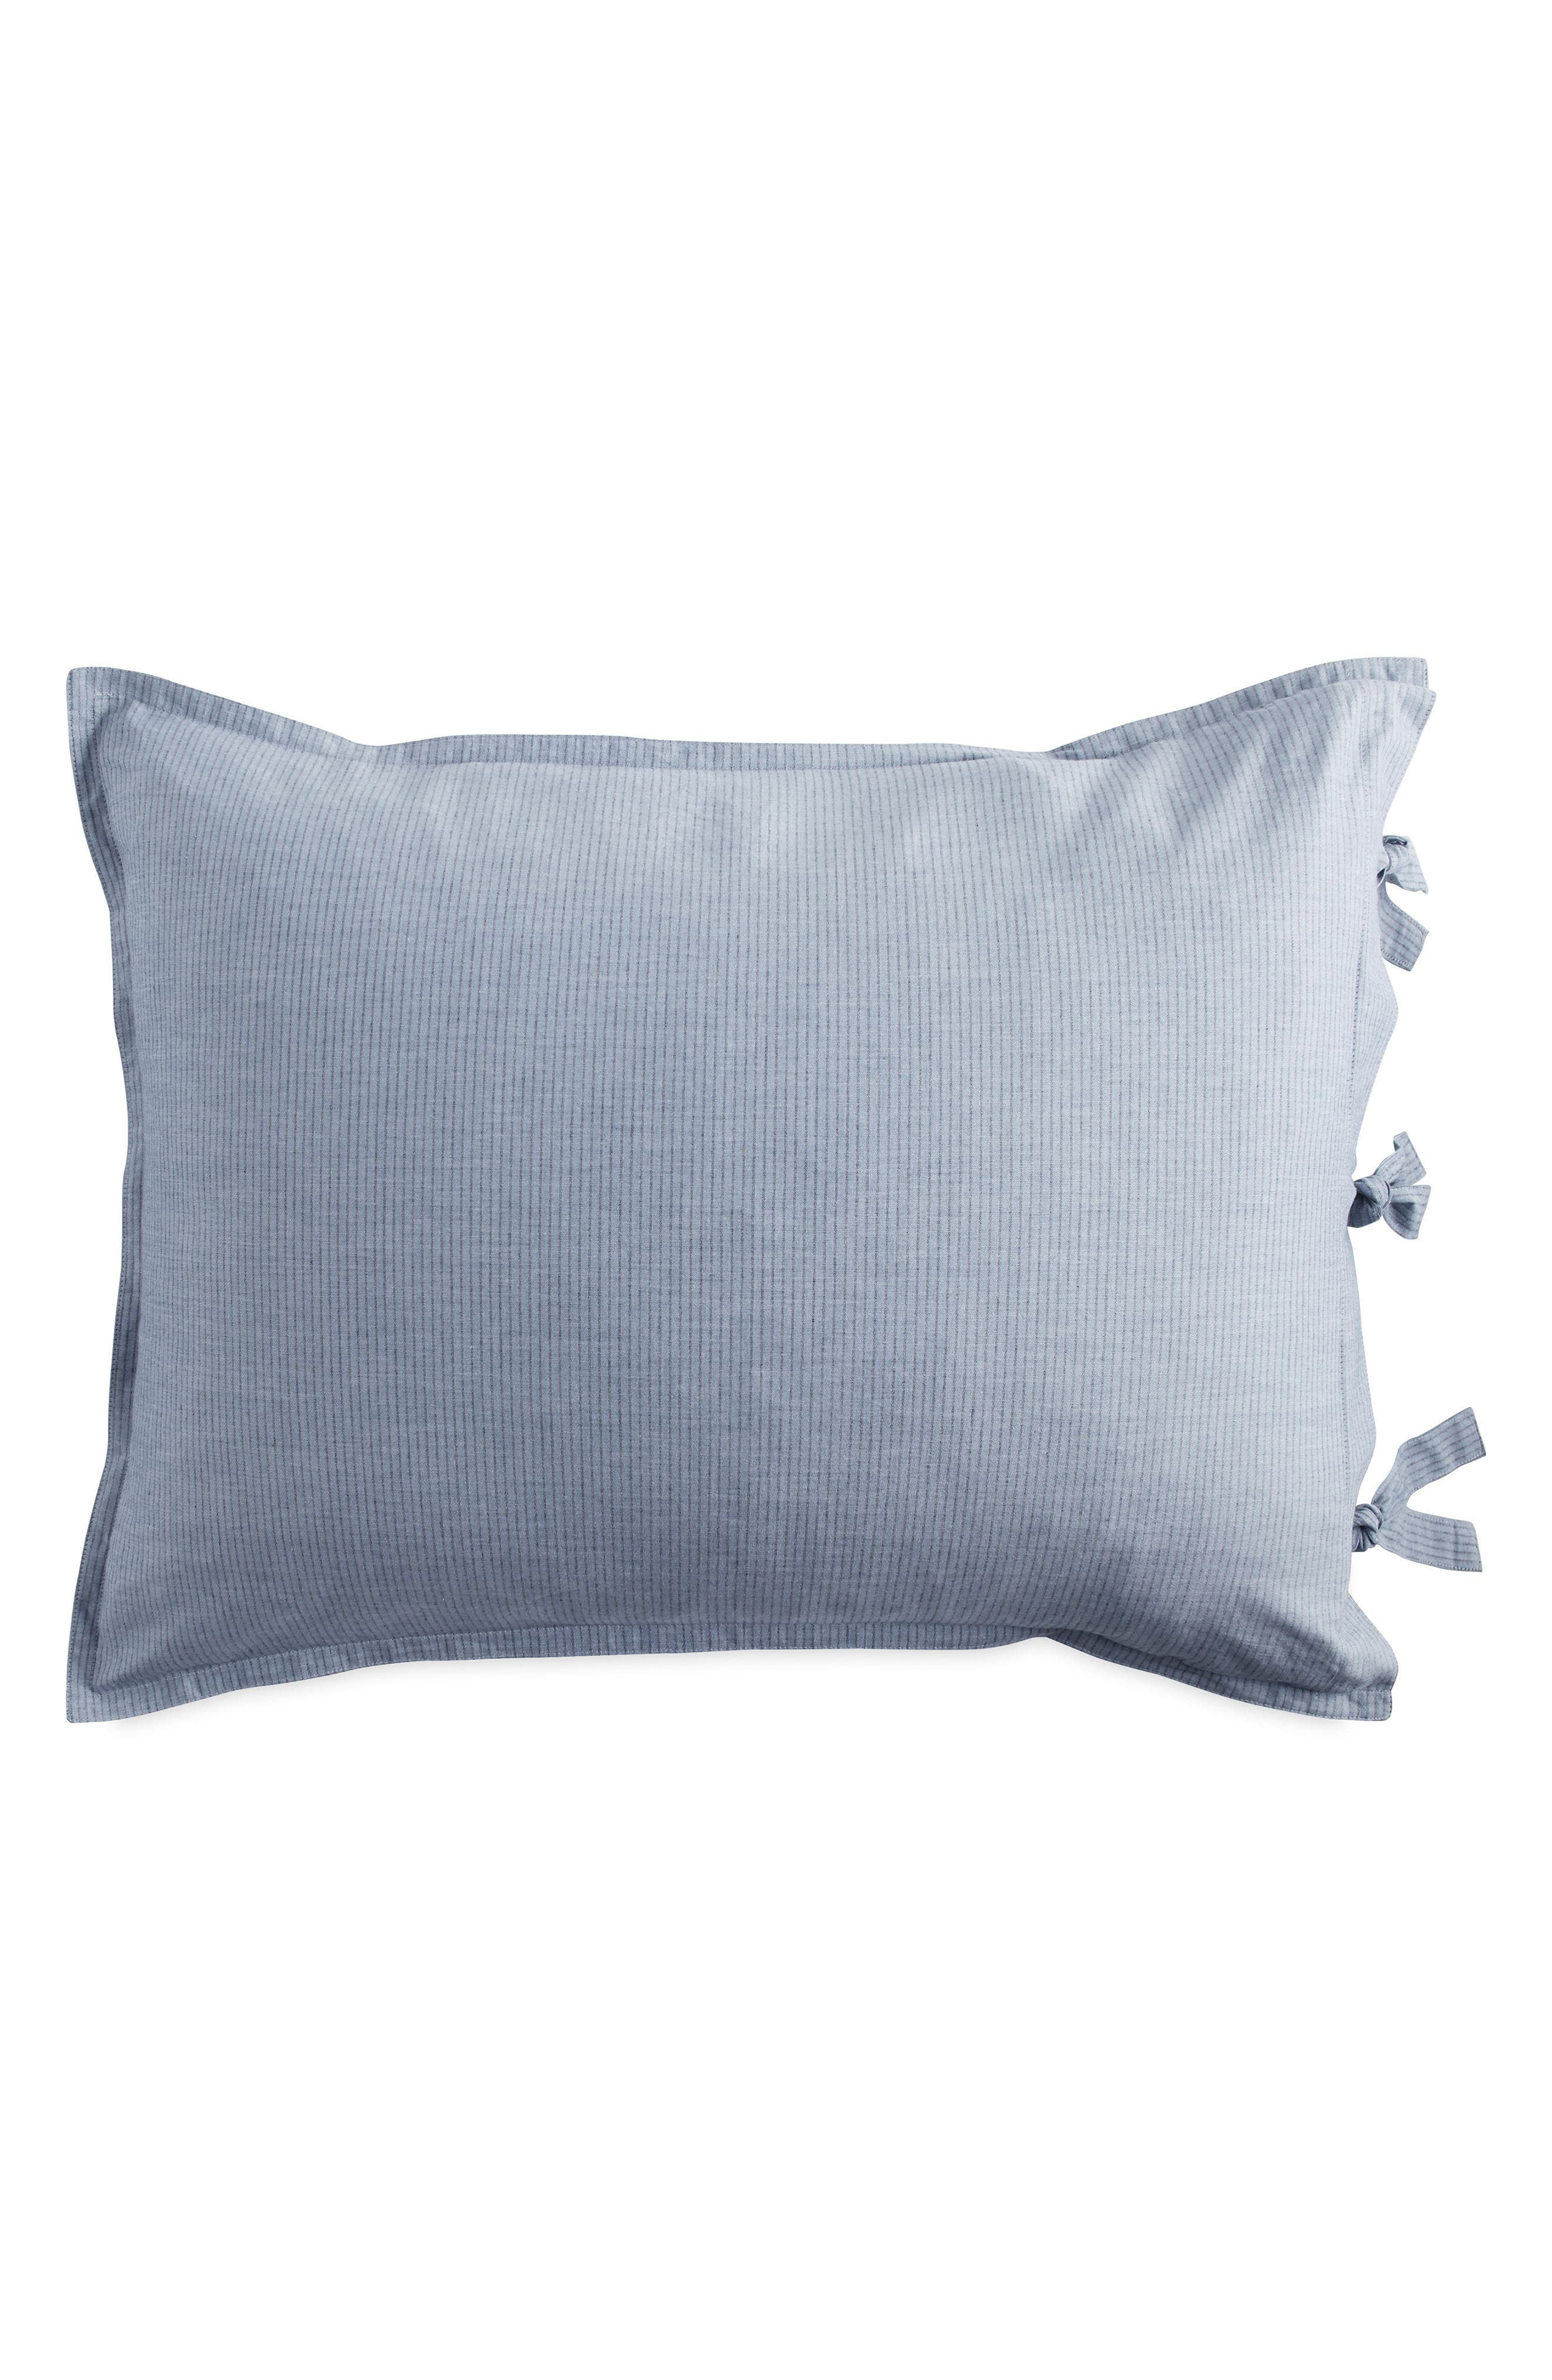 DKNY PURE Stripe Pillow Sham